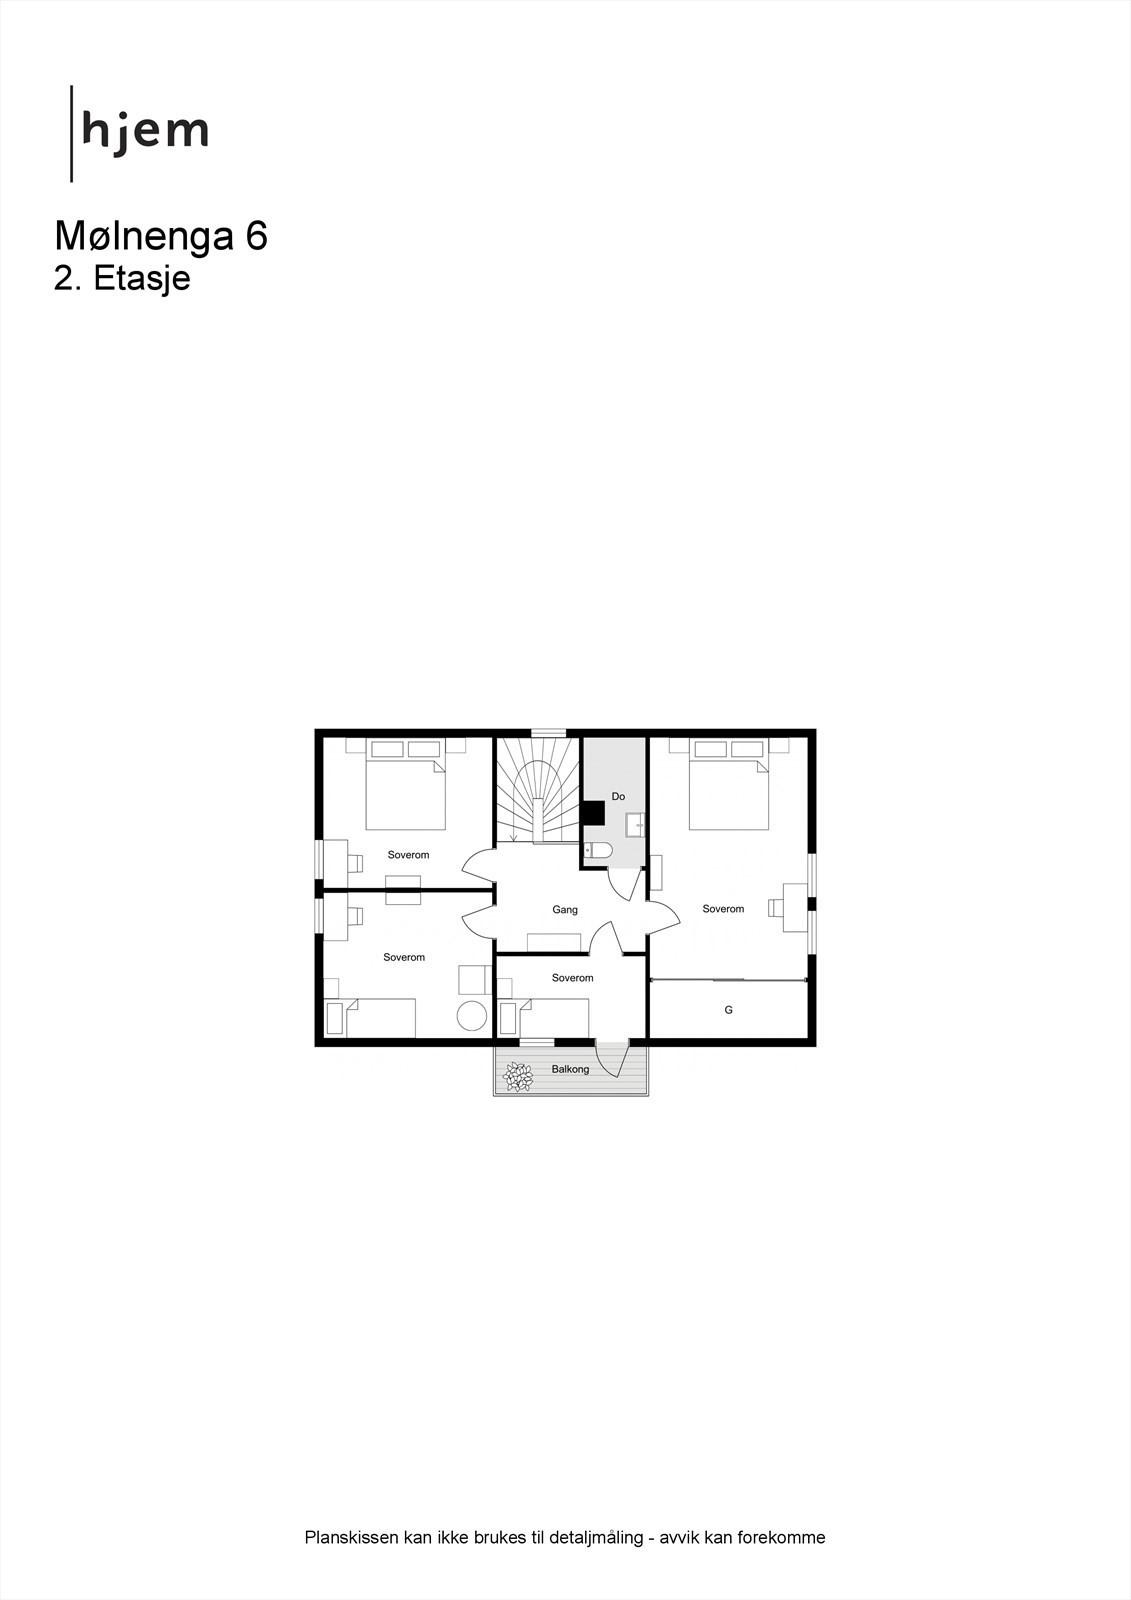 Mølnenga 6 - 2D - 2. Etasje - Letterhead.jpg